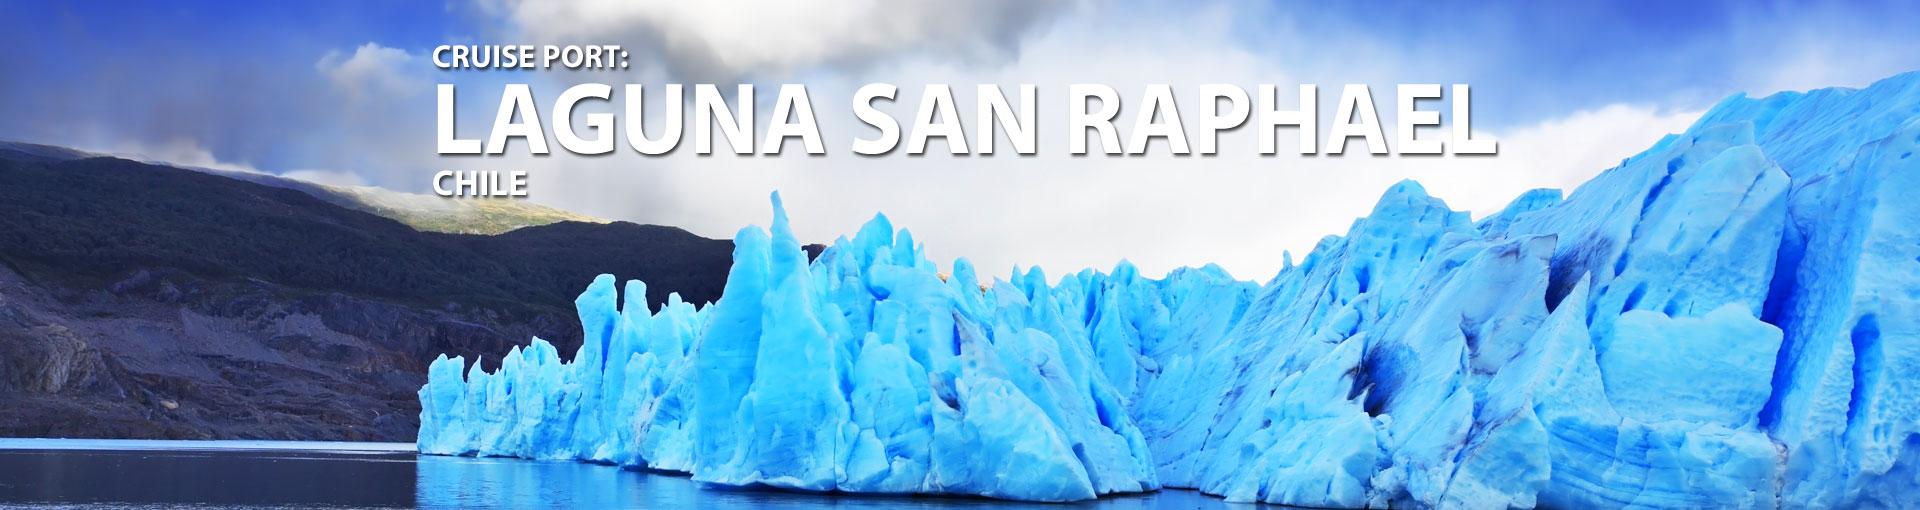 Cruise to Laguna San Raphael, Chile